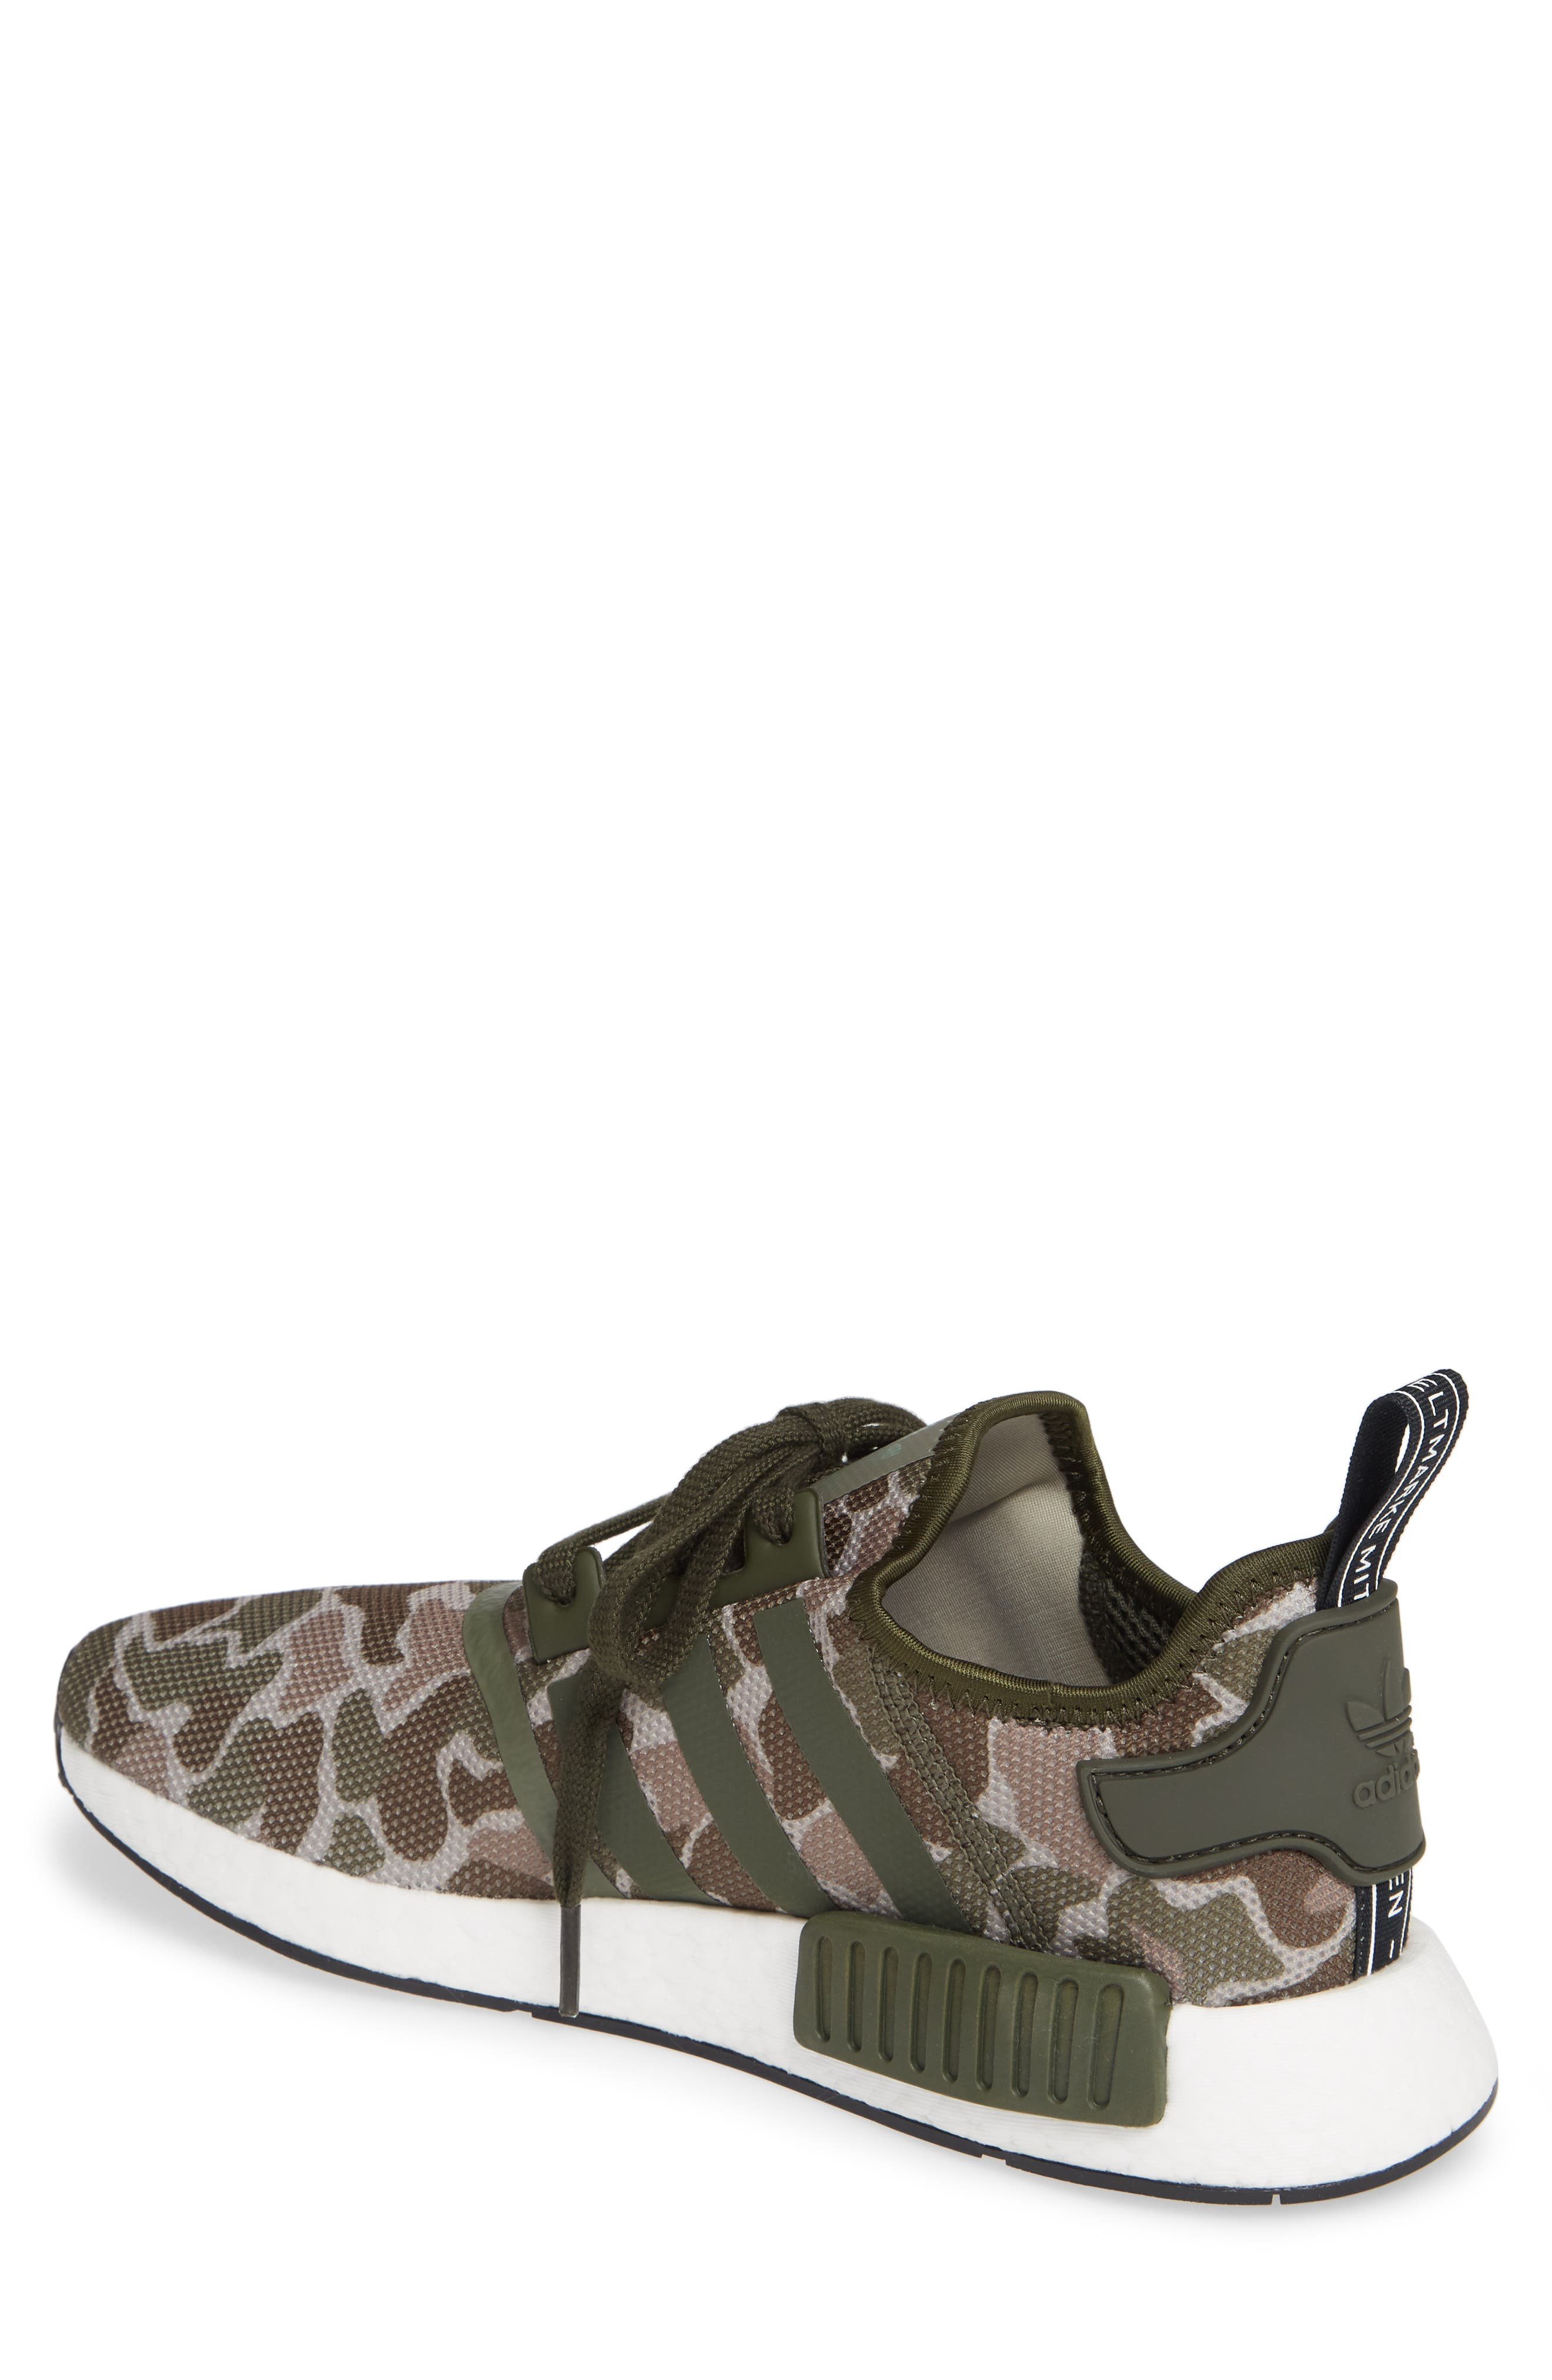 NMD R1 Camo Sneaker,                             Alternate thumbnail 2, color,                             305